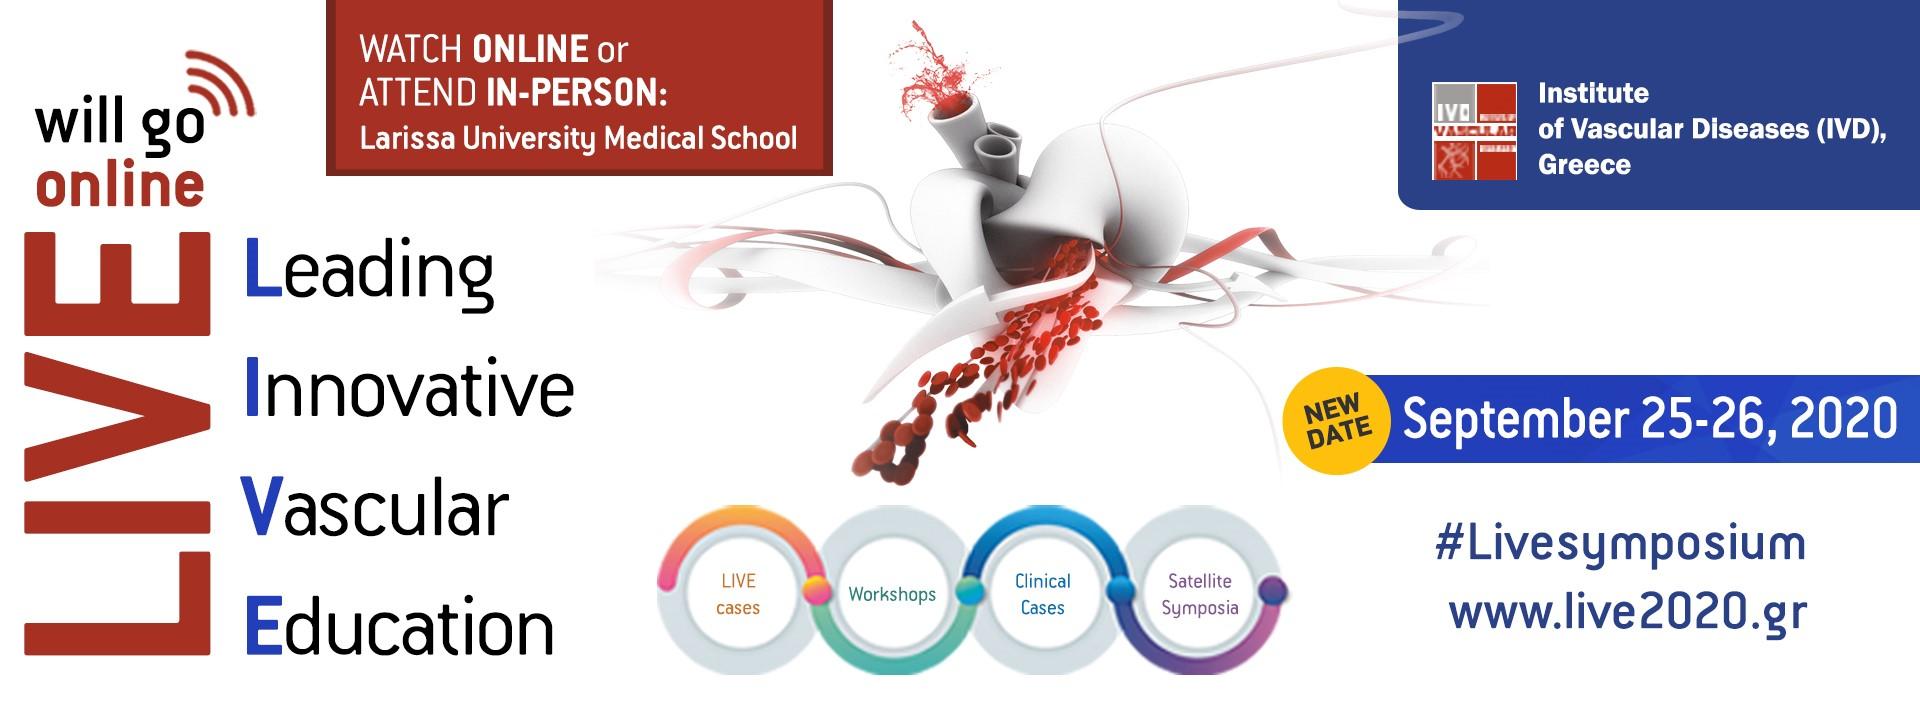 SeminarEdition of LIVE 2020 – LEADING INNOVATIVE VASCULAR EDUCATION SYMPOSIUM (25 - 26/9/2020, Larissa)